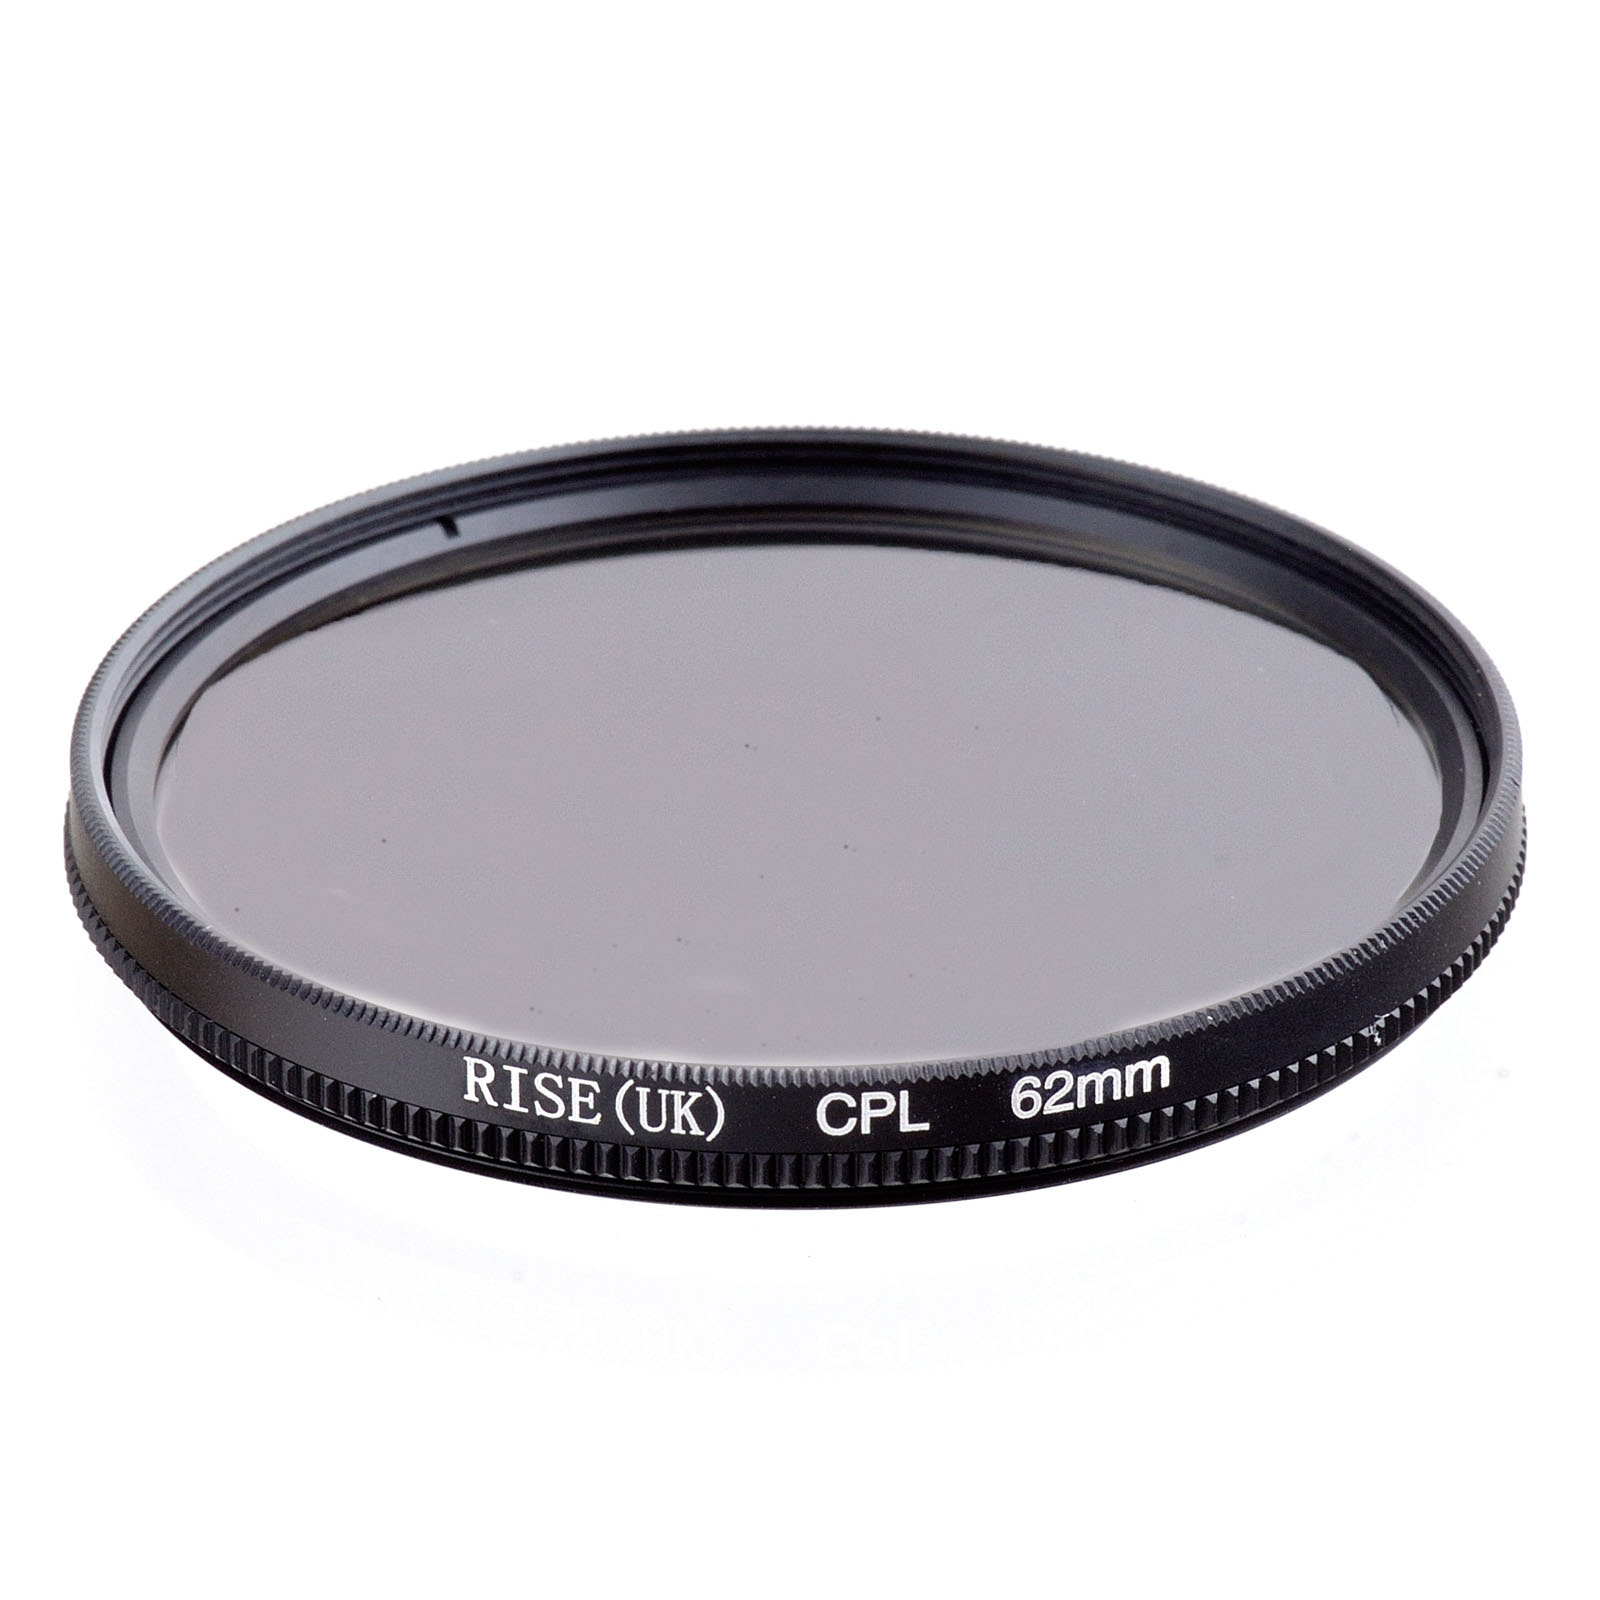 RISE 62mm Circular Polarizing CPL C PL Filter Lens 62mm For Canon NIKON Sony Olympus Camera